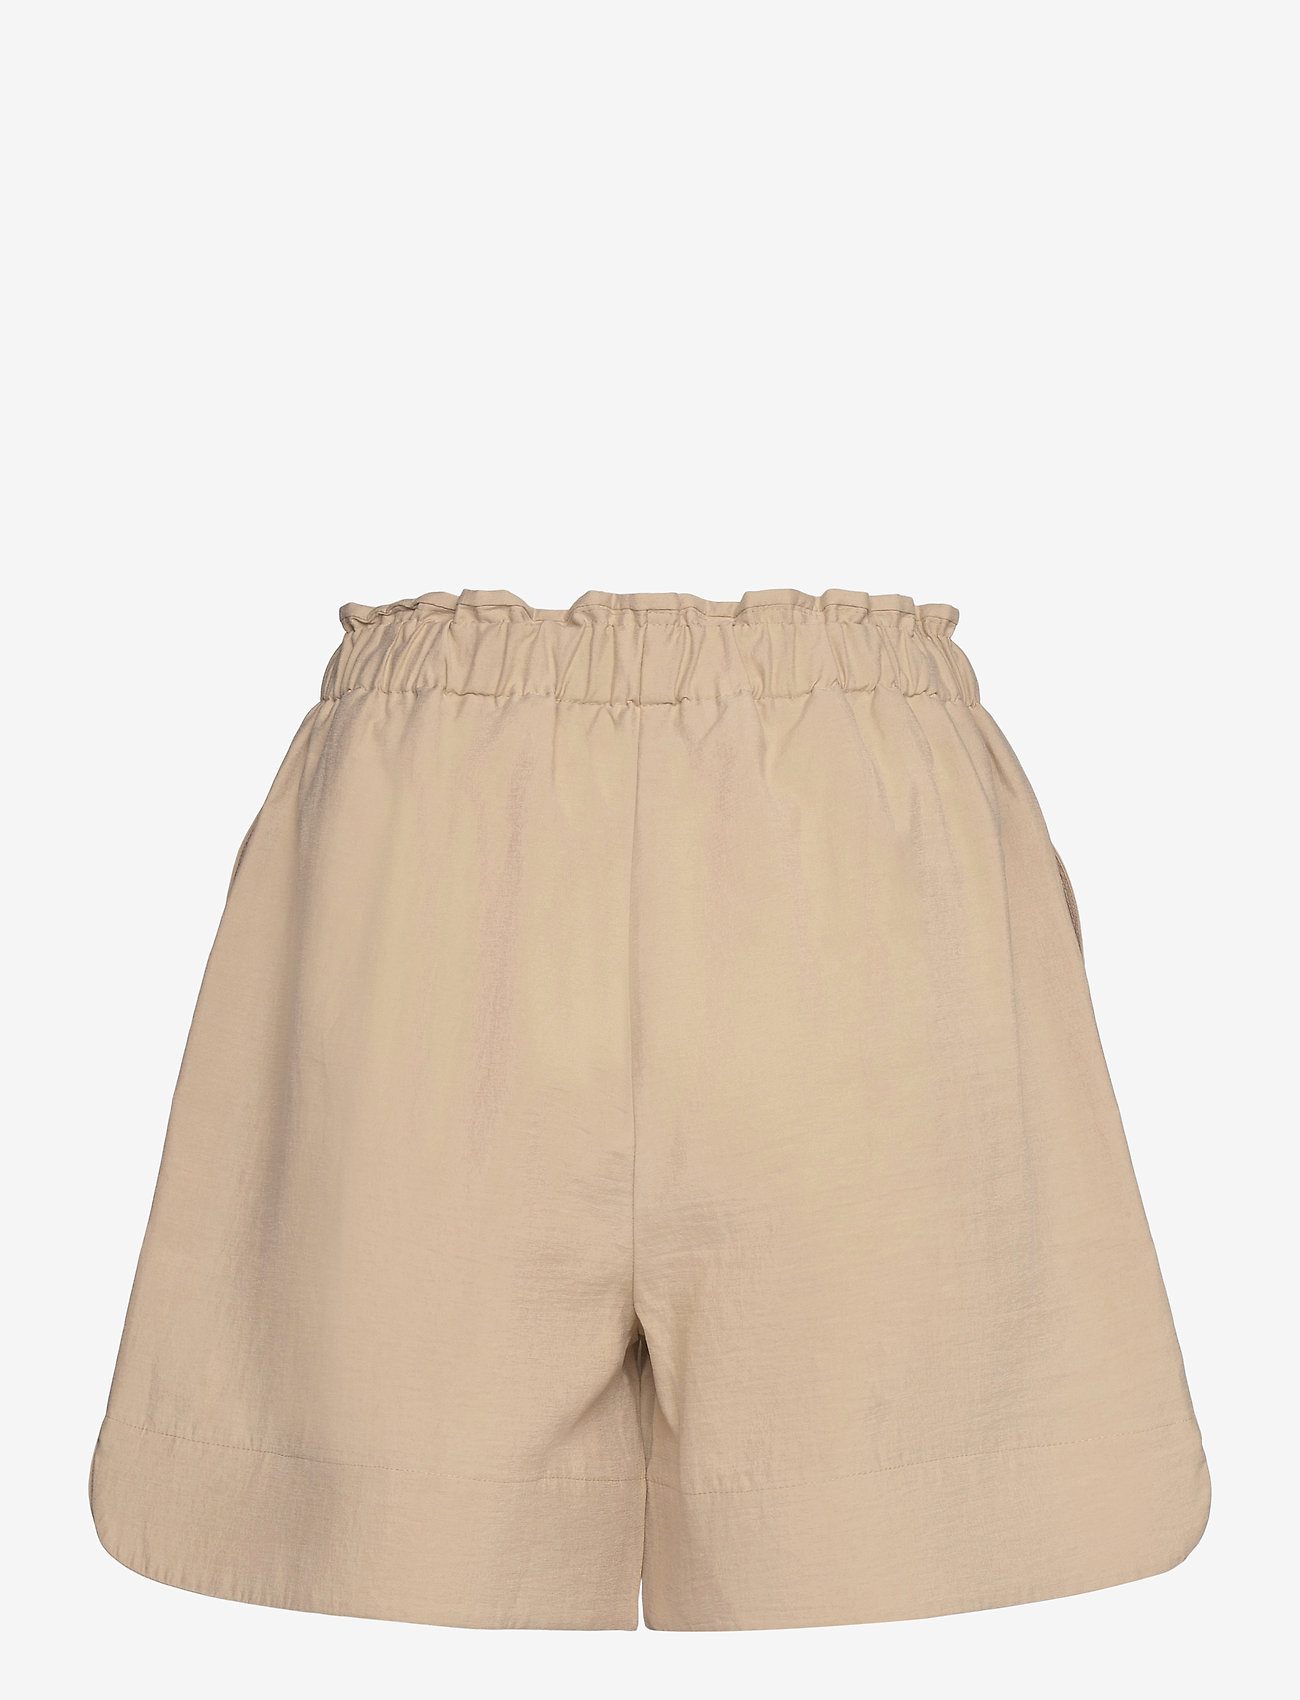 RODEBJER - RODEBJER MILA - paper bag shorts - linen - 1